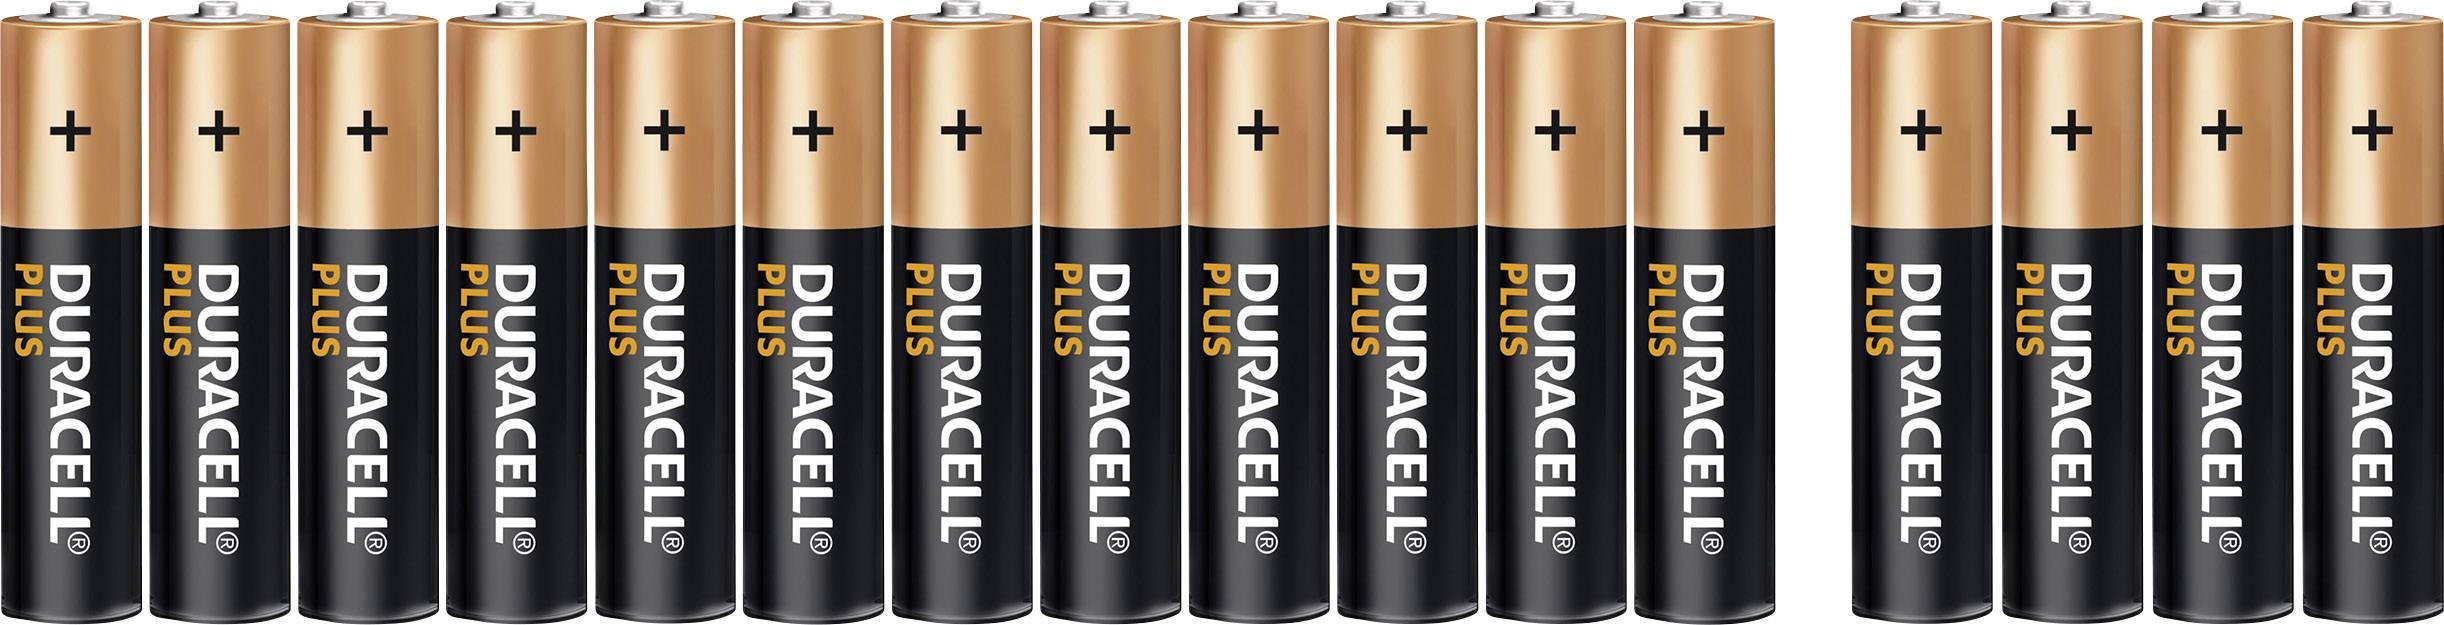 Duracell Micro -batterie Alkali-mangan Plus Power Lr03 1.5v 24st. aaa